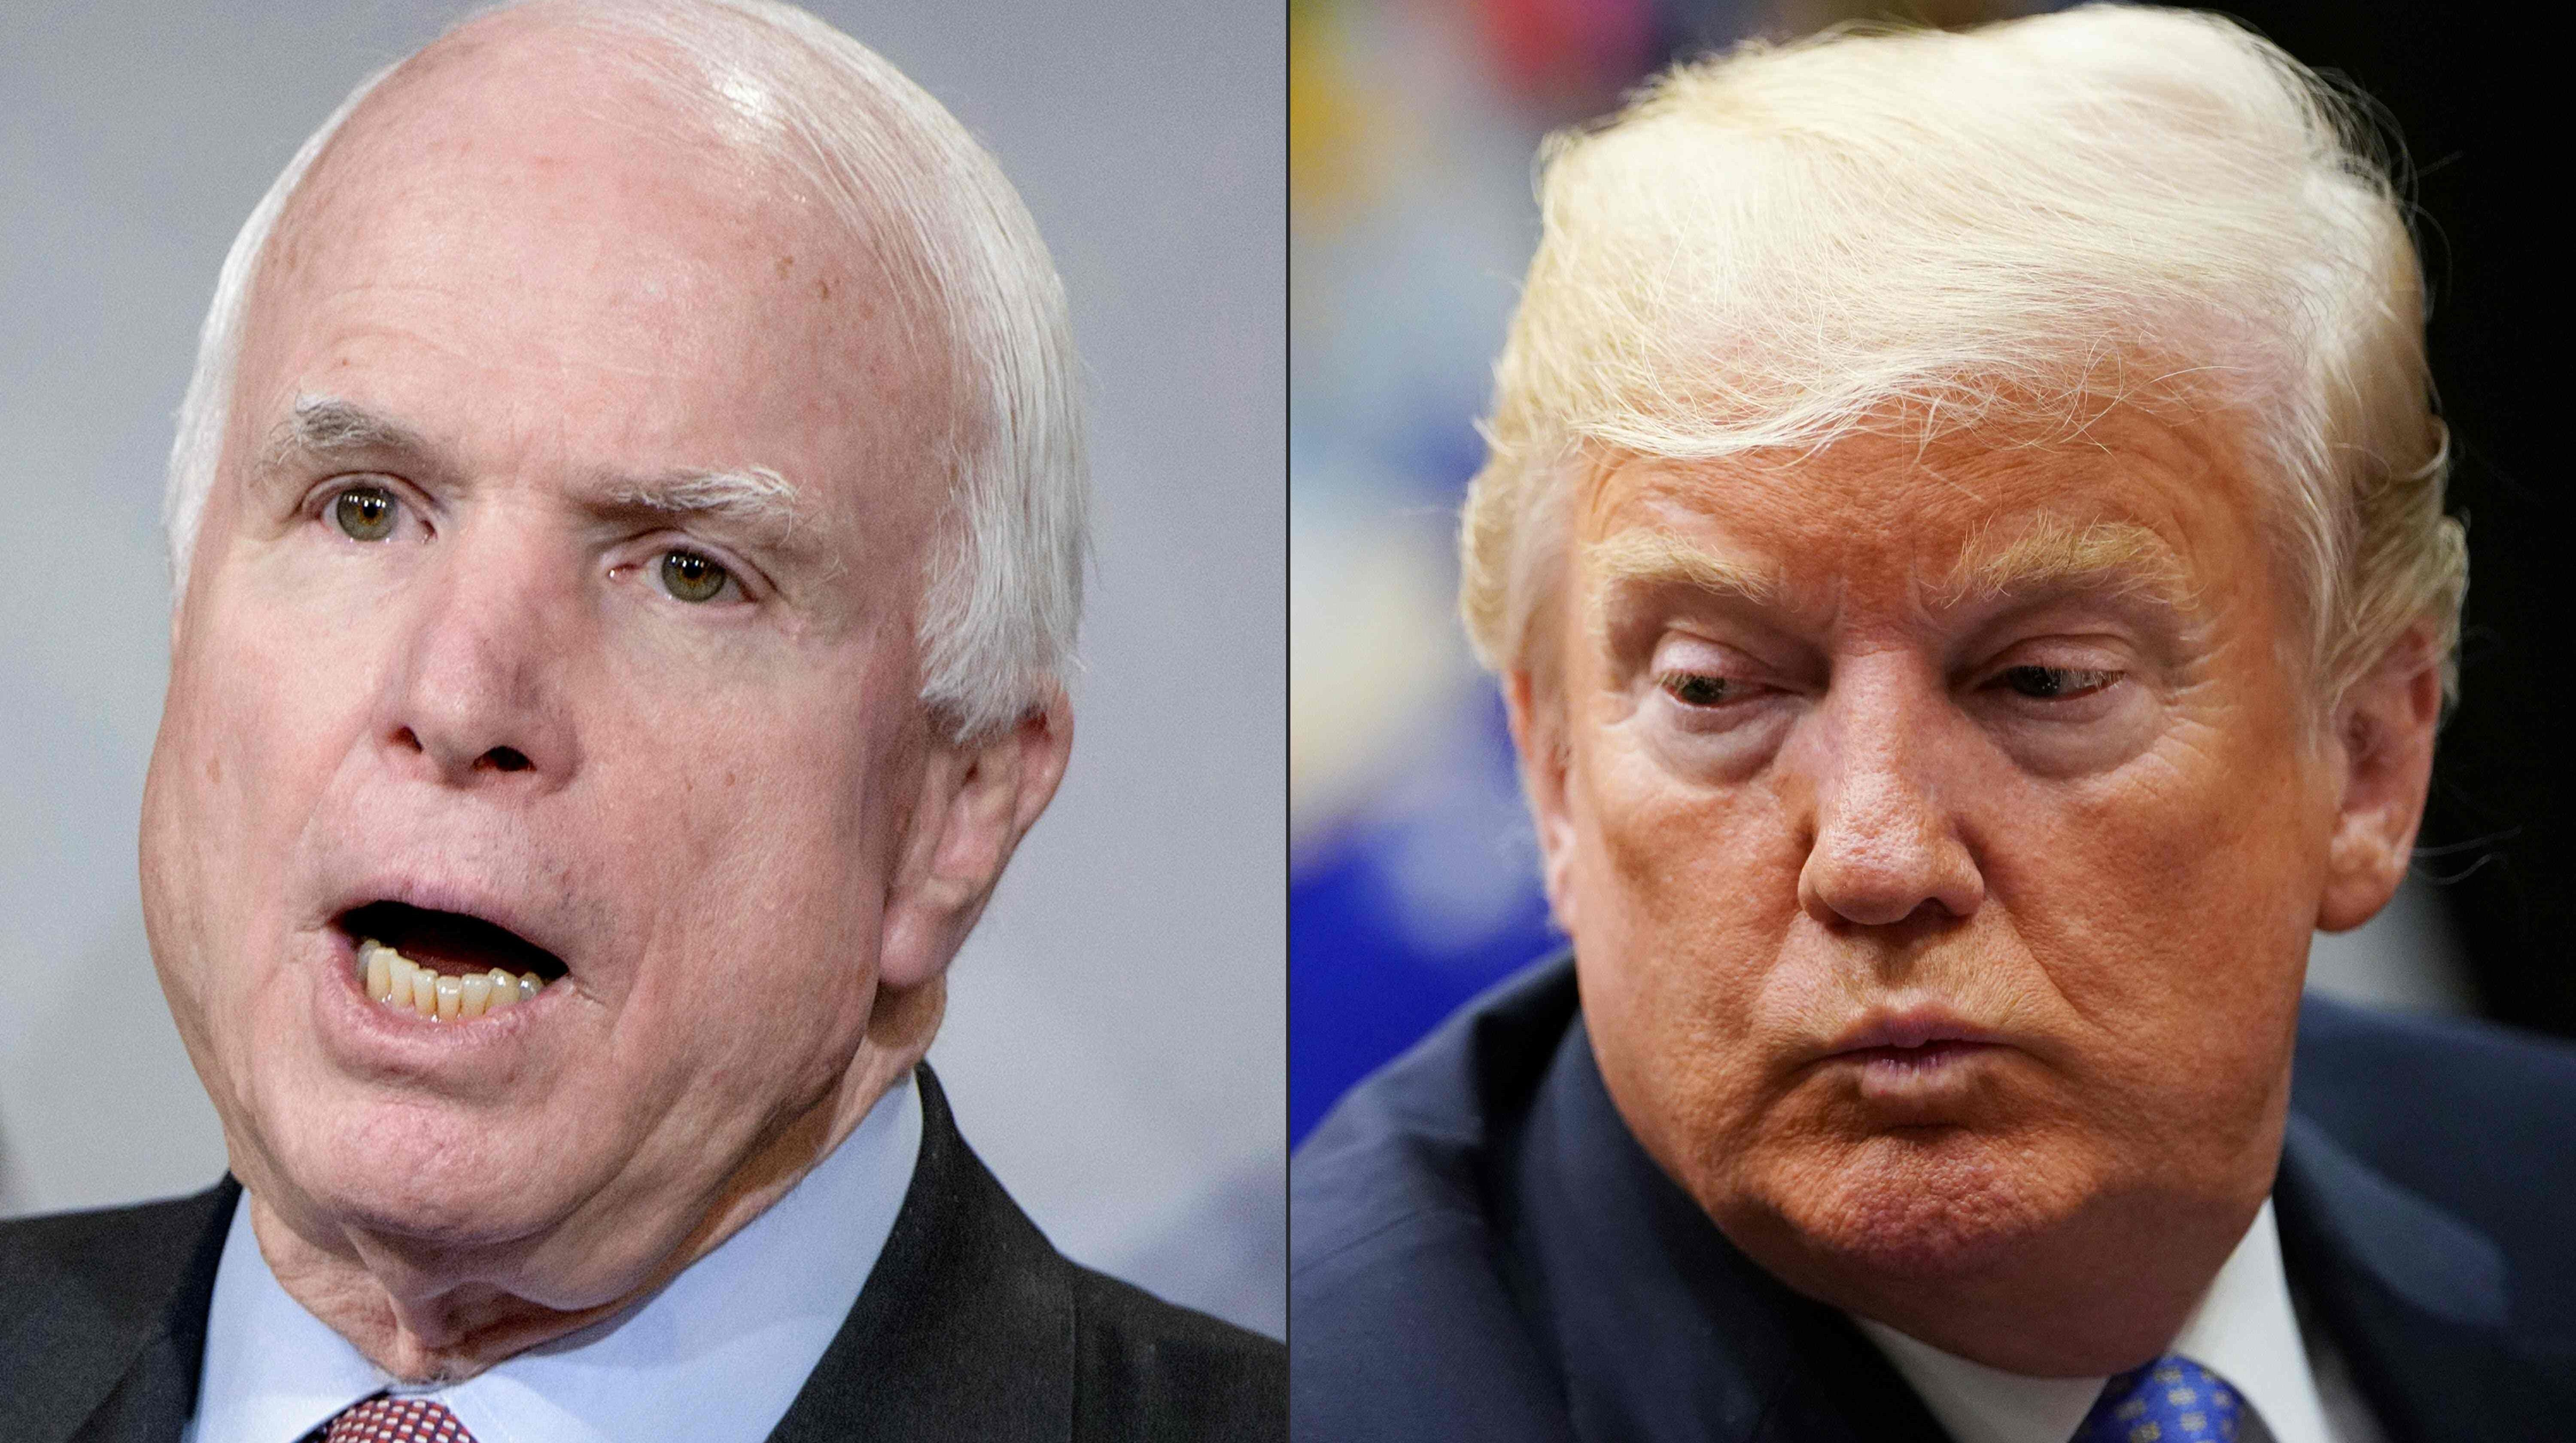 The late John McCain and Donald Trump.